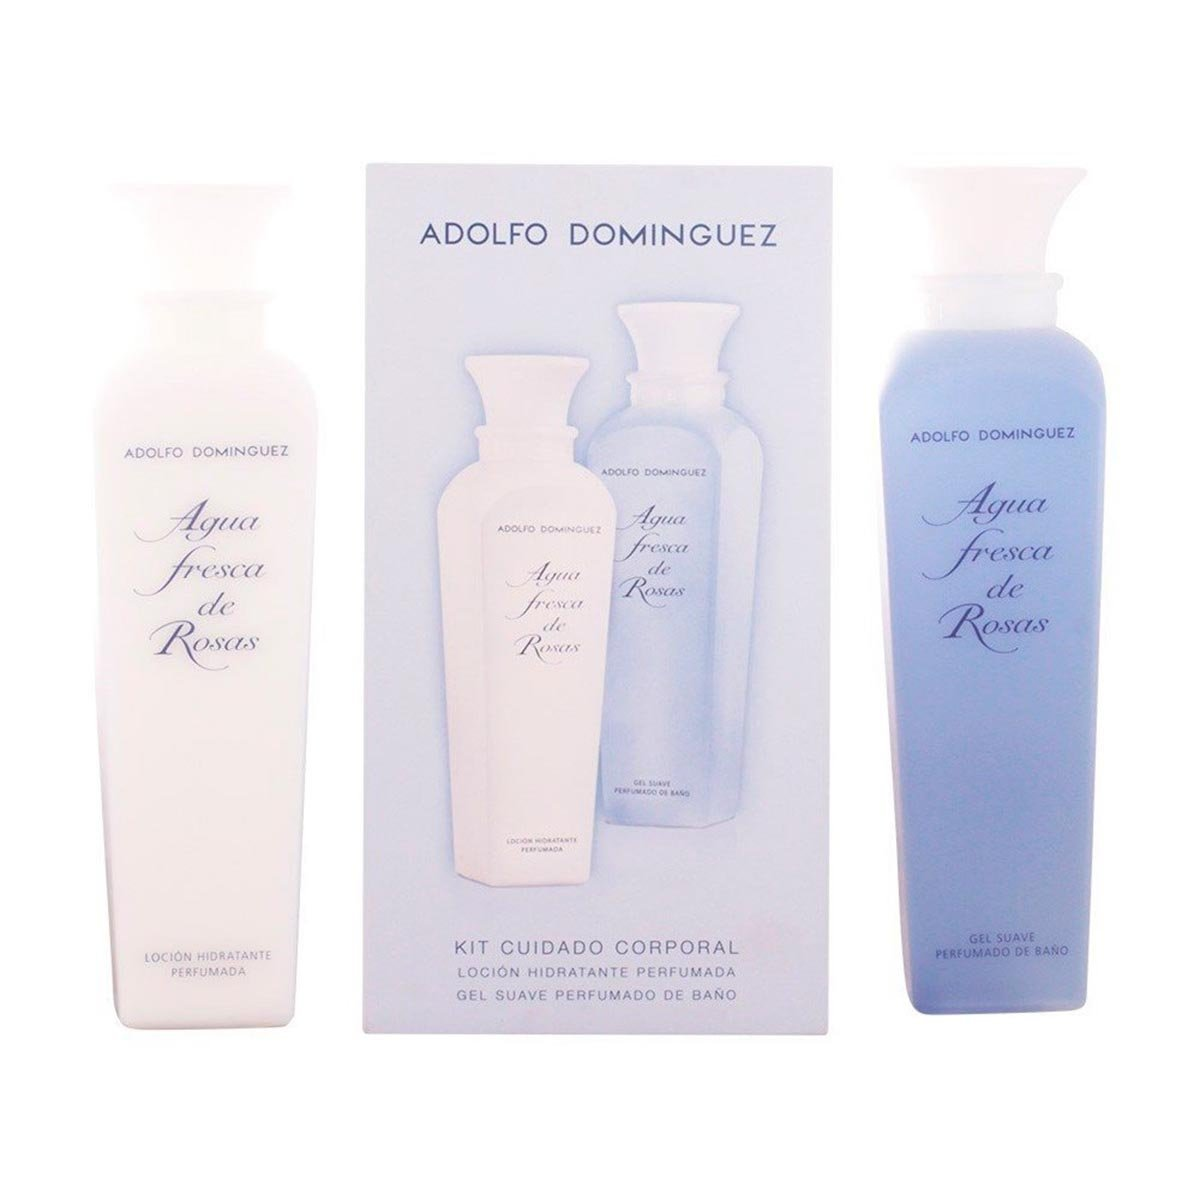 Adolfo DomíNguez - Estuche de regalo agua fresca de rosas